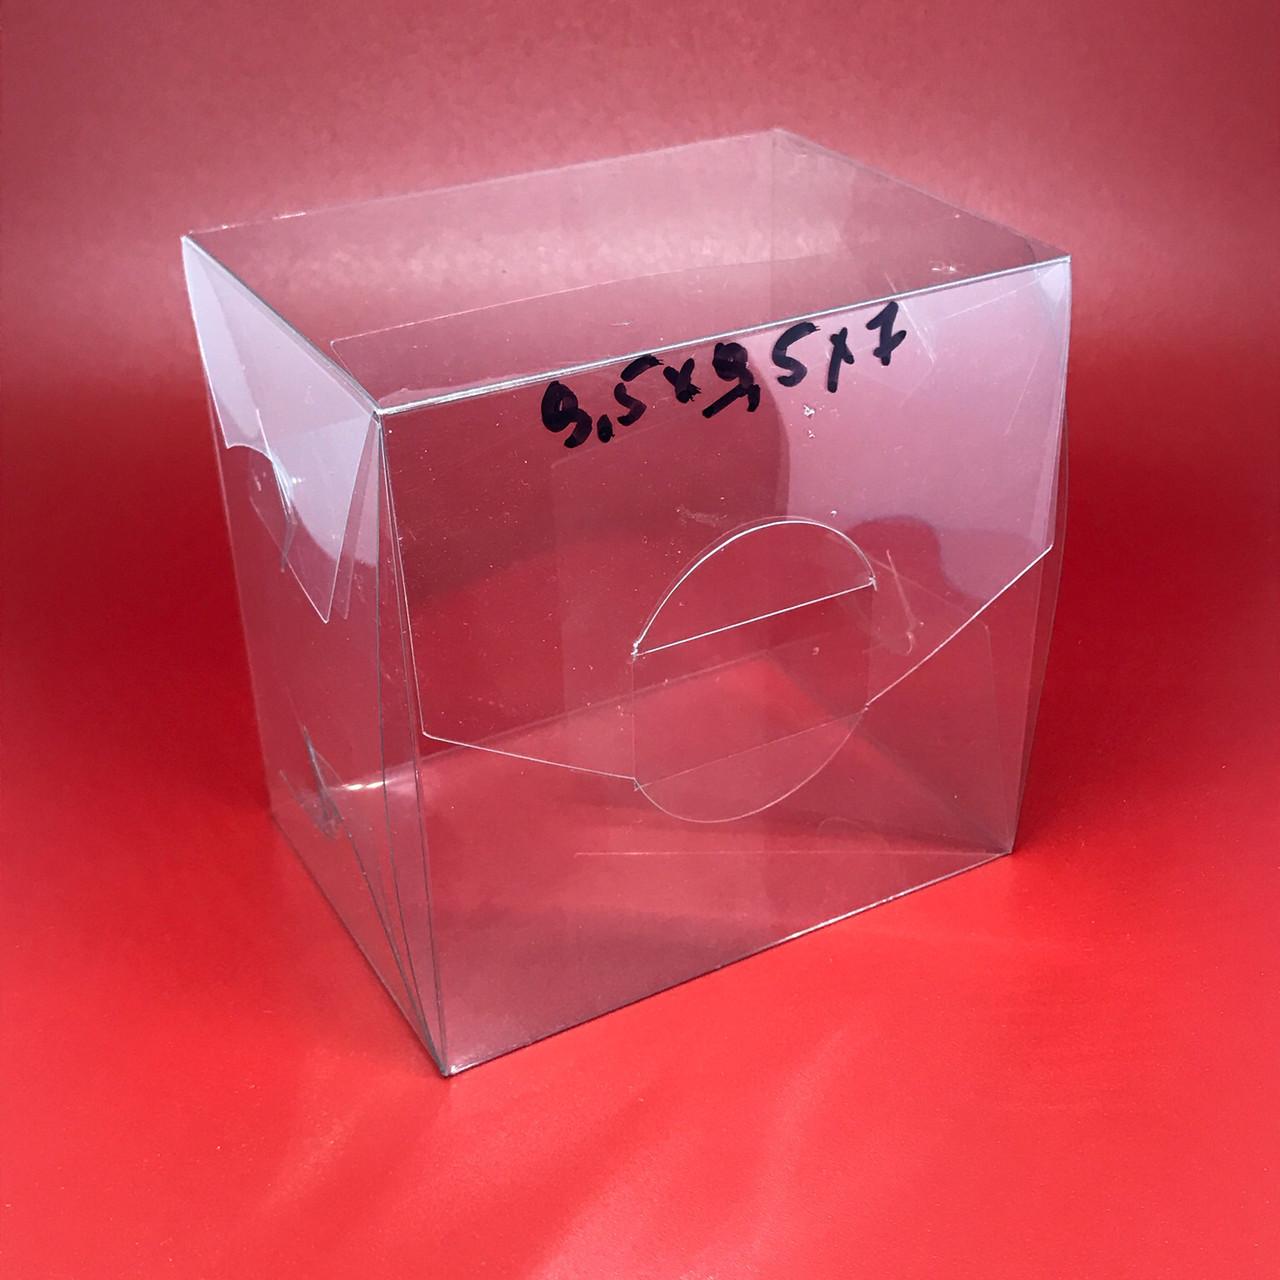 Прозрачные пластиковые упаковки. 9.5х9.5х7см